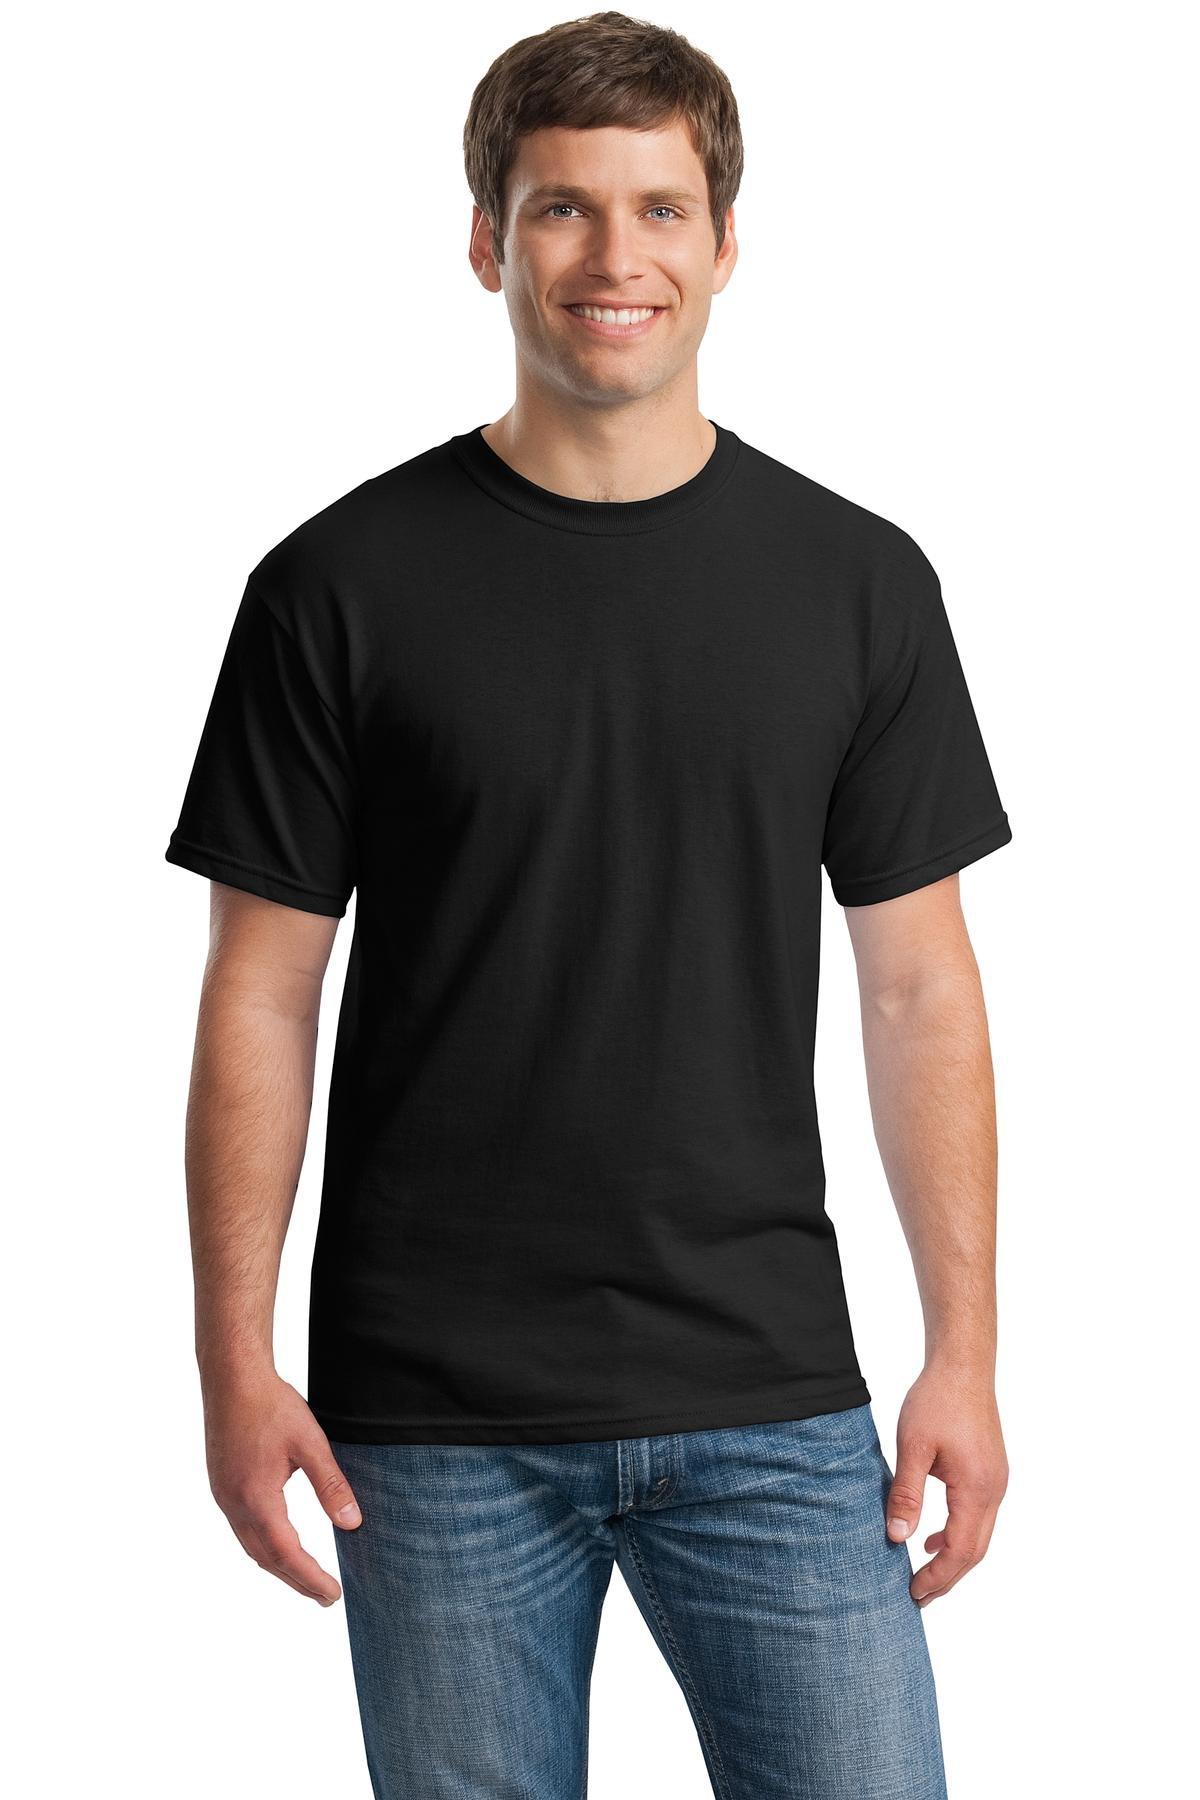 Gildan mens Heavy Cotton 5.3 oz. T-Shirt(G500)-BLACK-L-10PK by Gildan